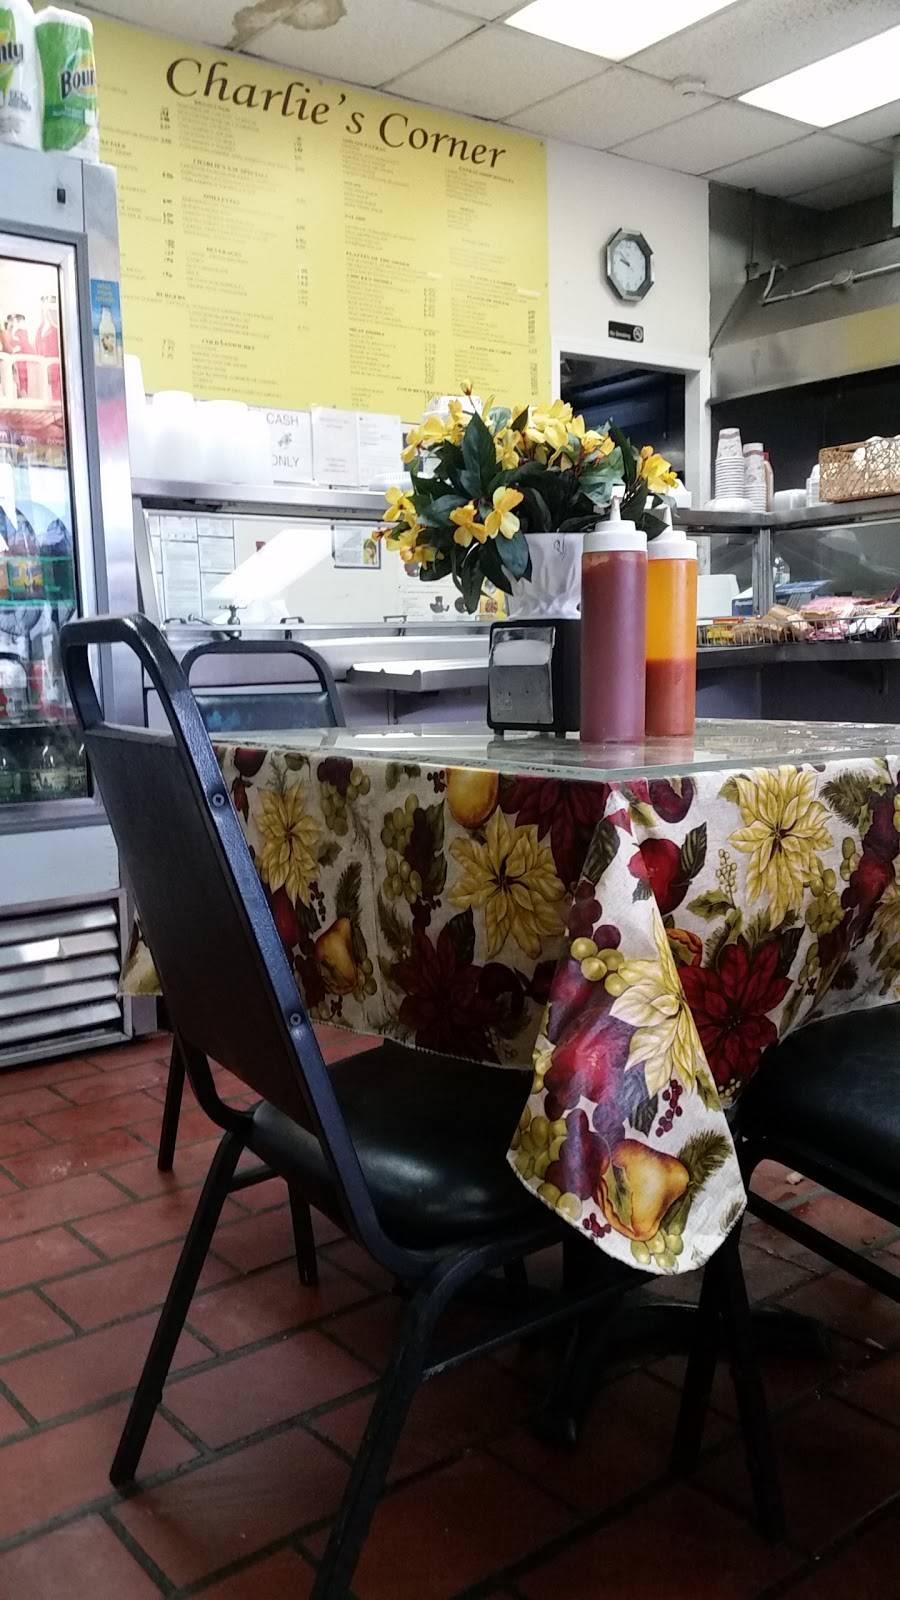 Charlies Corner Inc | restaurant | 537 Park Ave, Brooklyn, NY 11205, USA | 7188759705 OR +1 718-875-9705